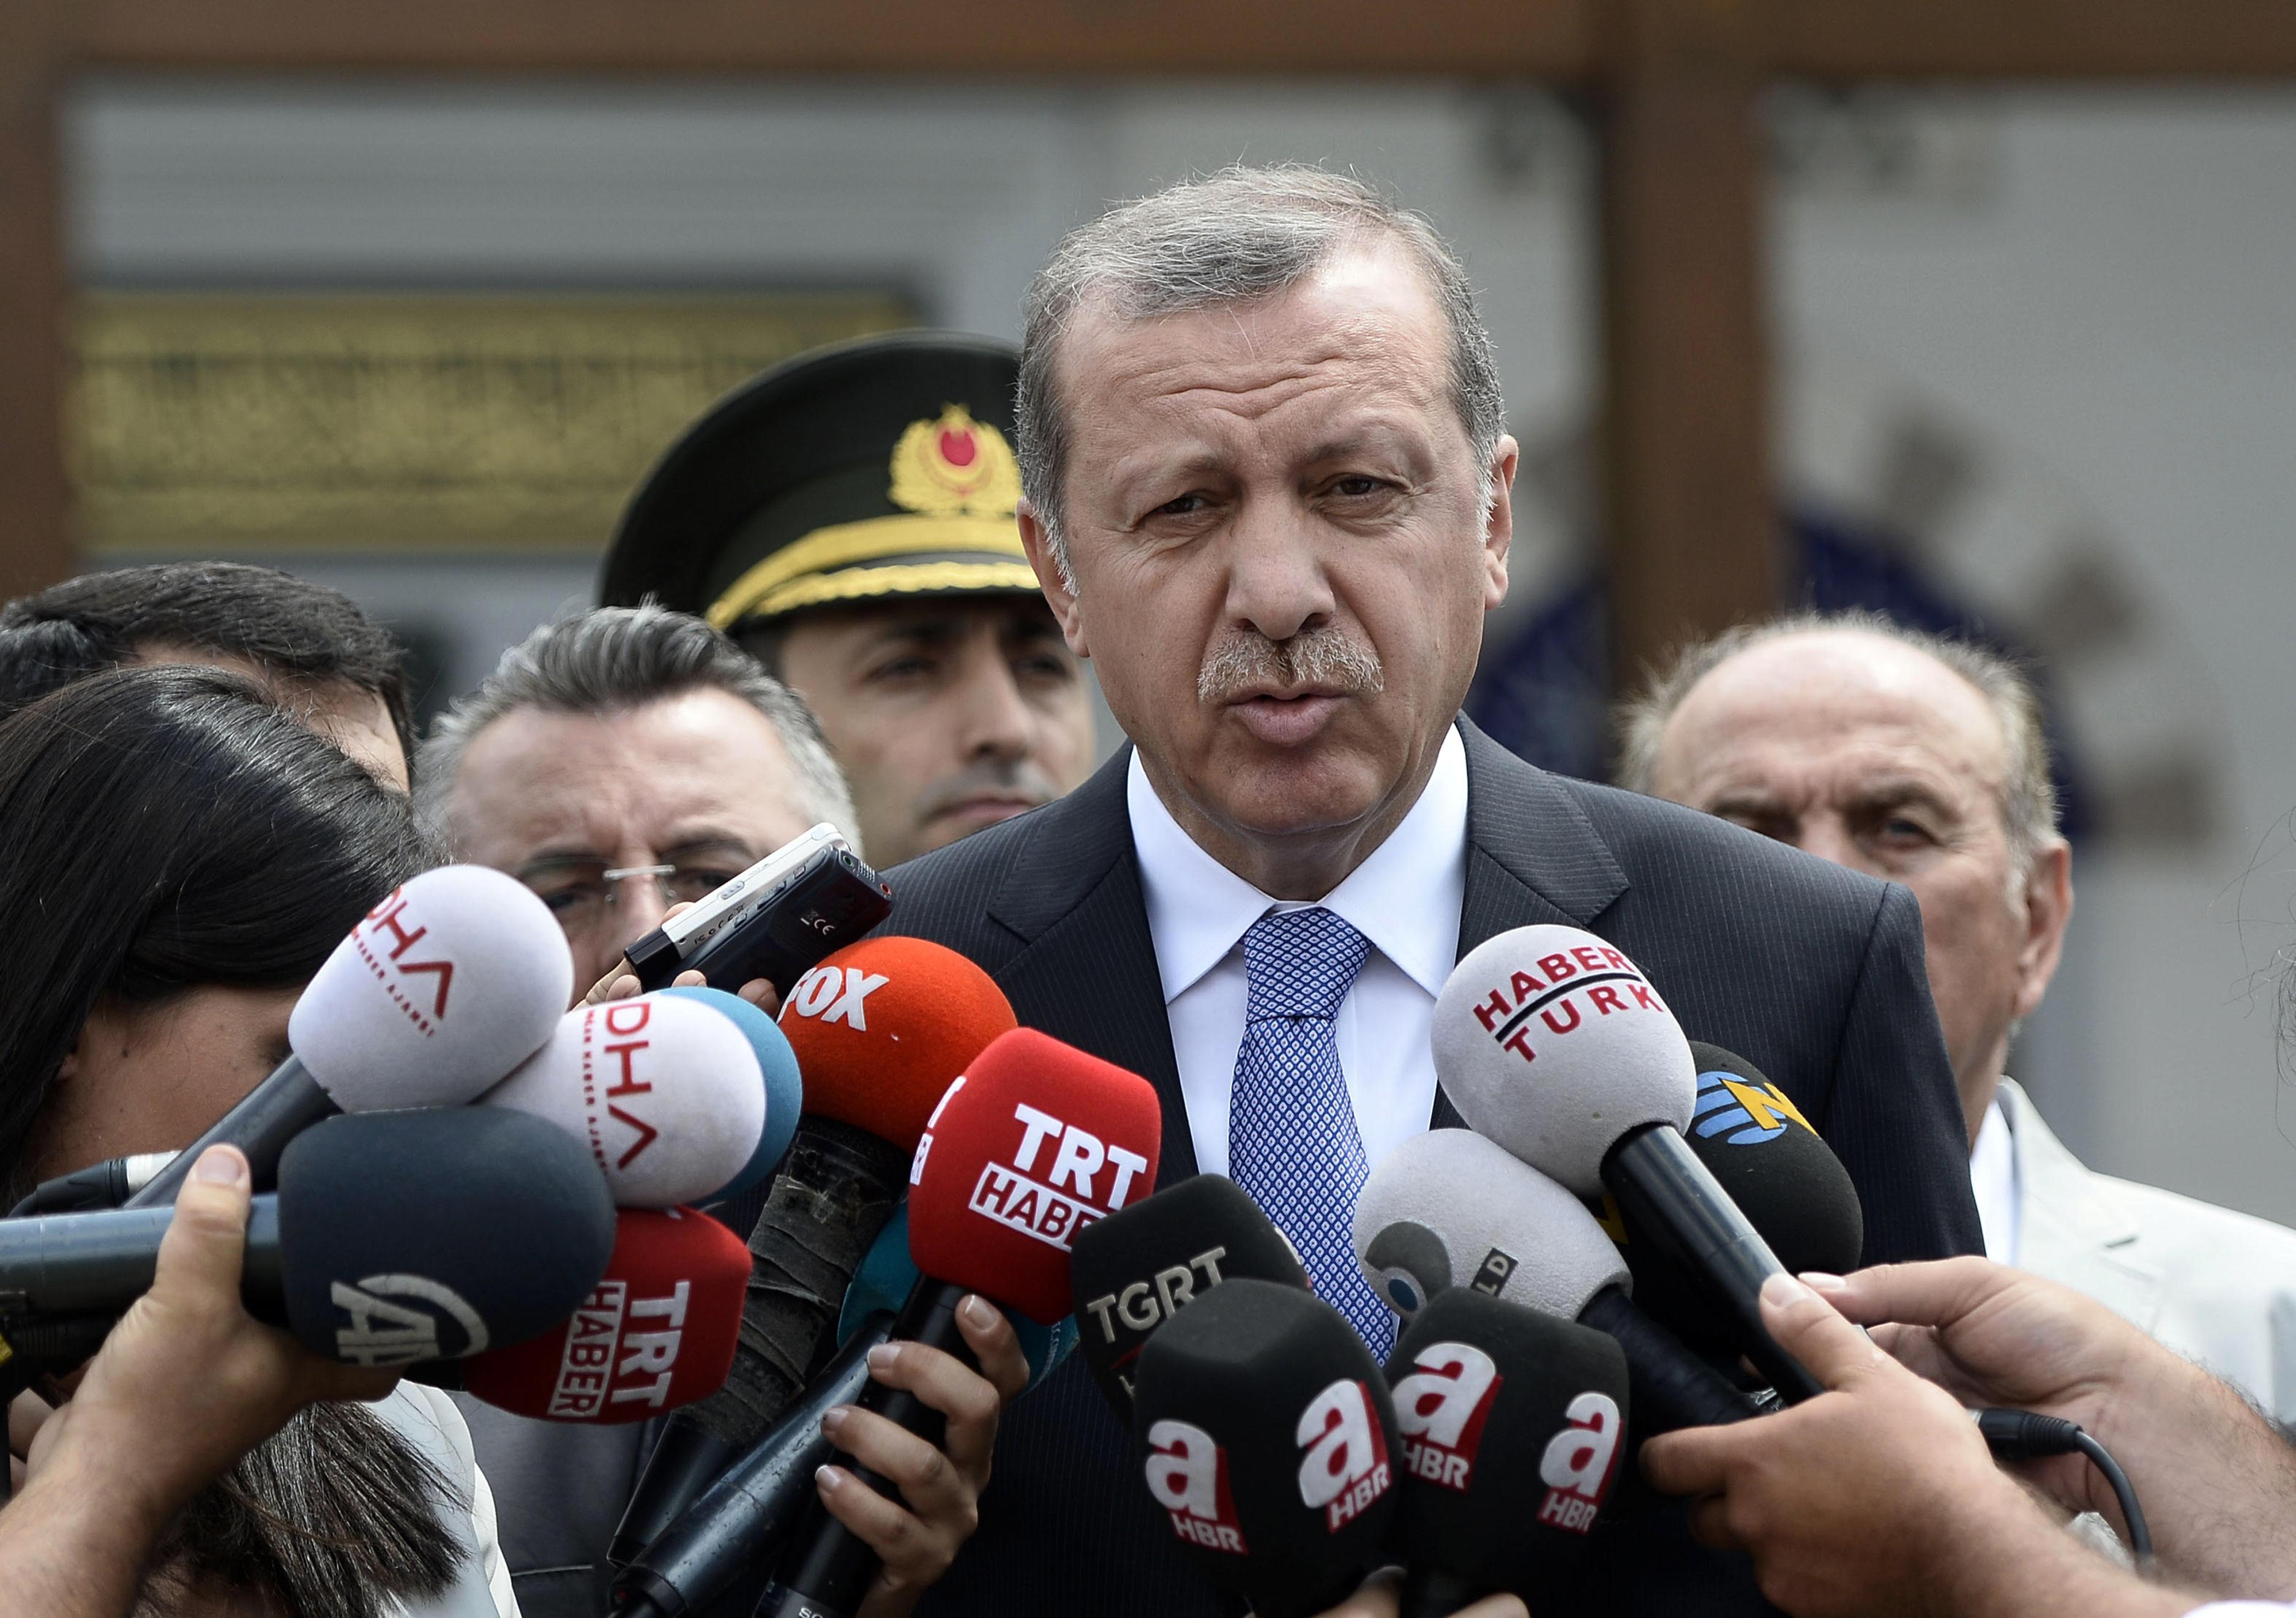 Turkish President's Cynical Maneuvers Weaken Fight Against ISIS